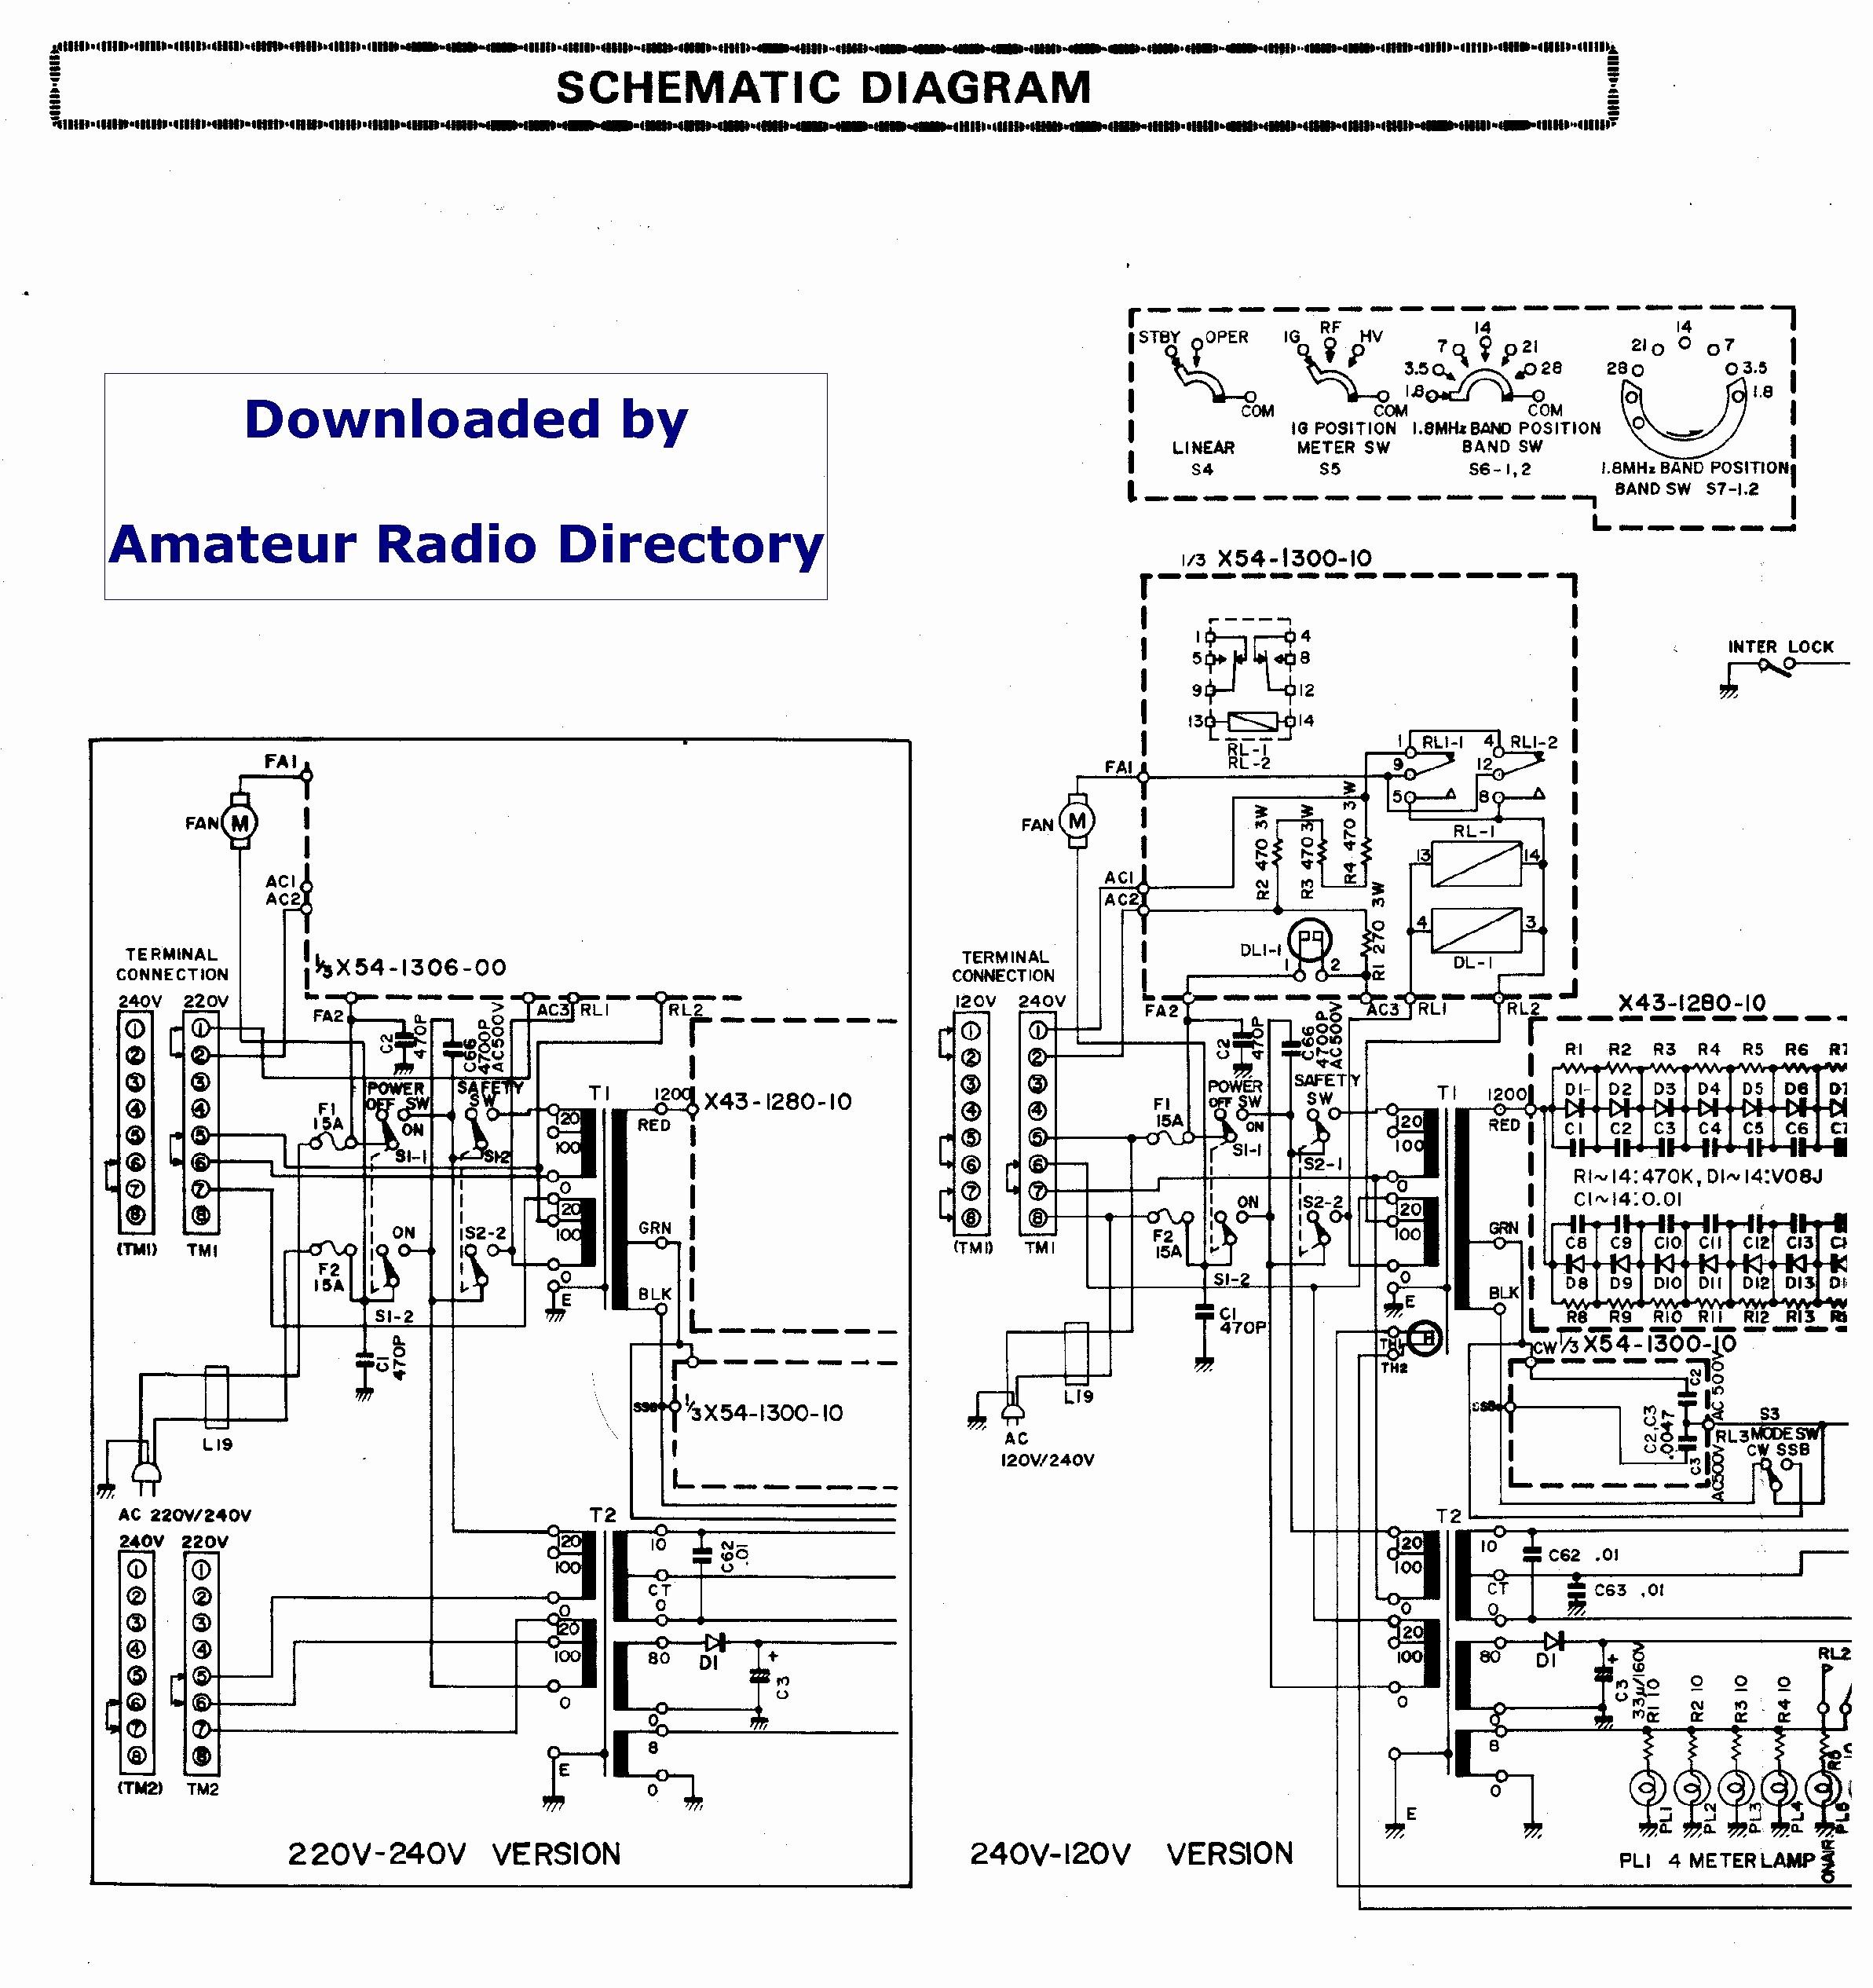 Kenwood Kvt 514 Wiring Diagram: Kenwood Kdc 148 Wiring Diagram -rh:archivodecreadores.com,Design